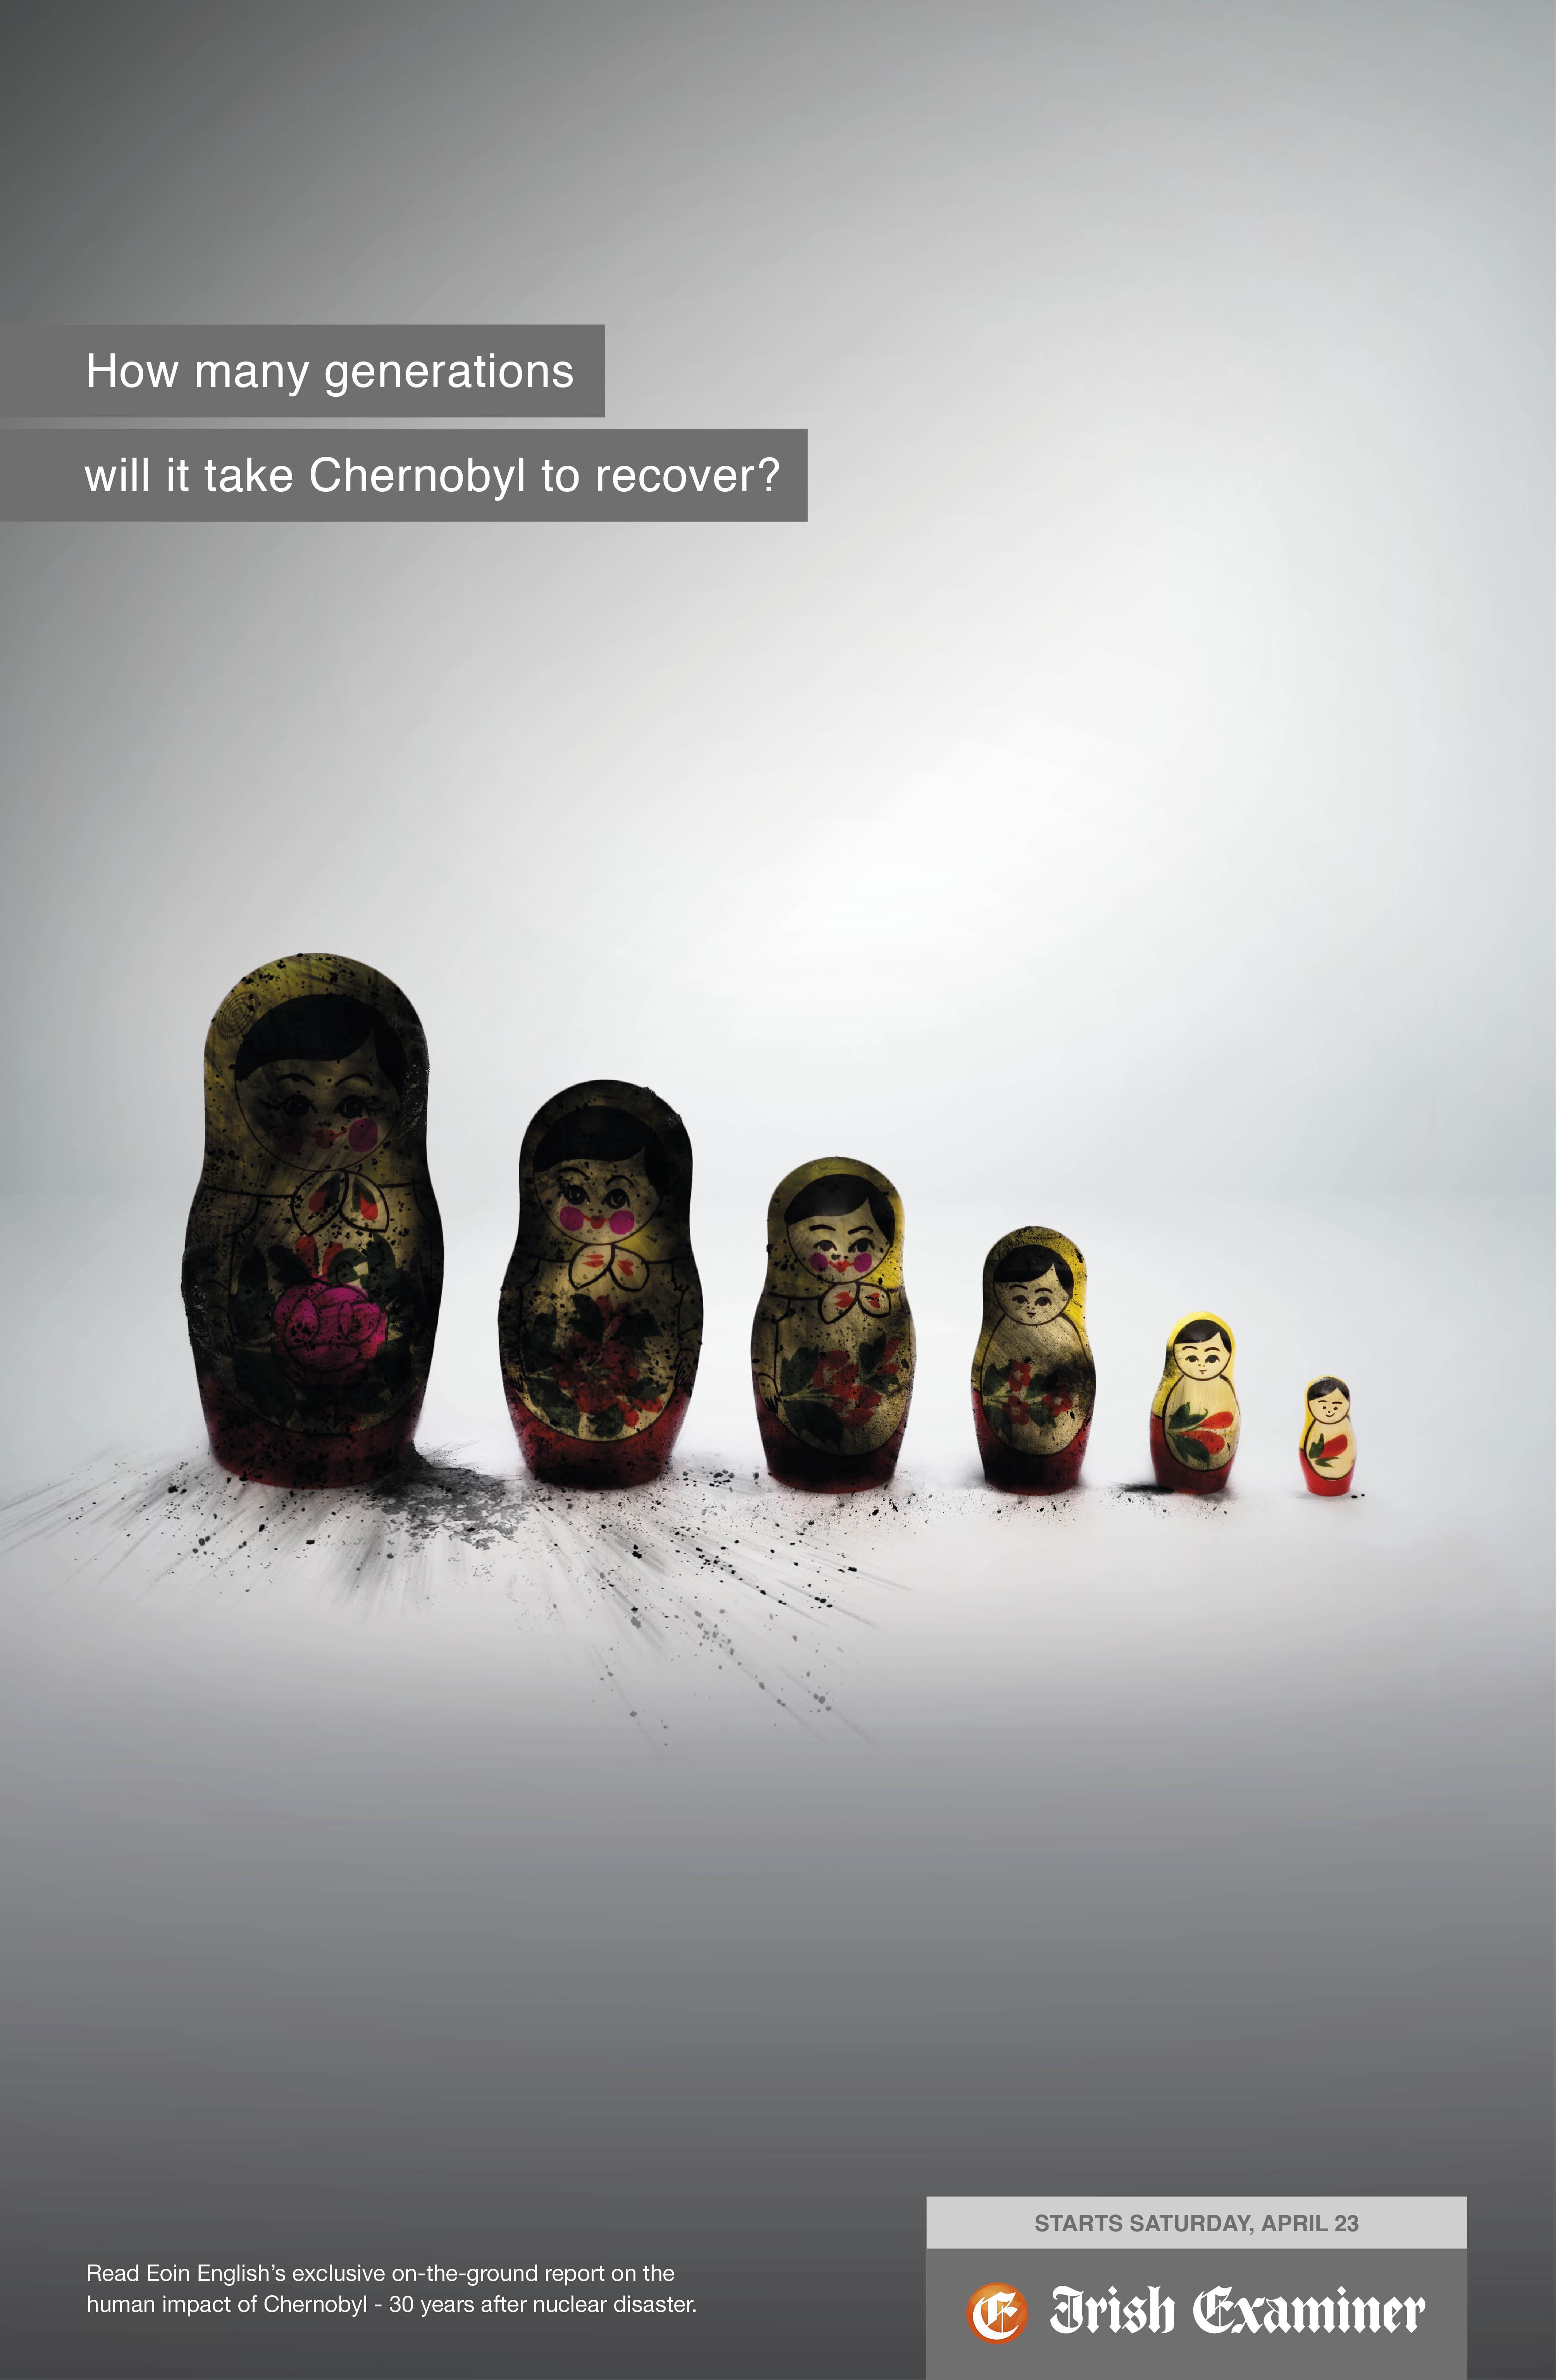 Chernobyl Full page 2